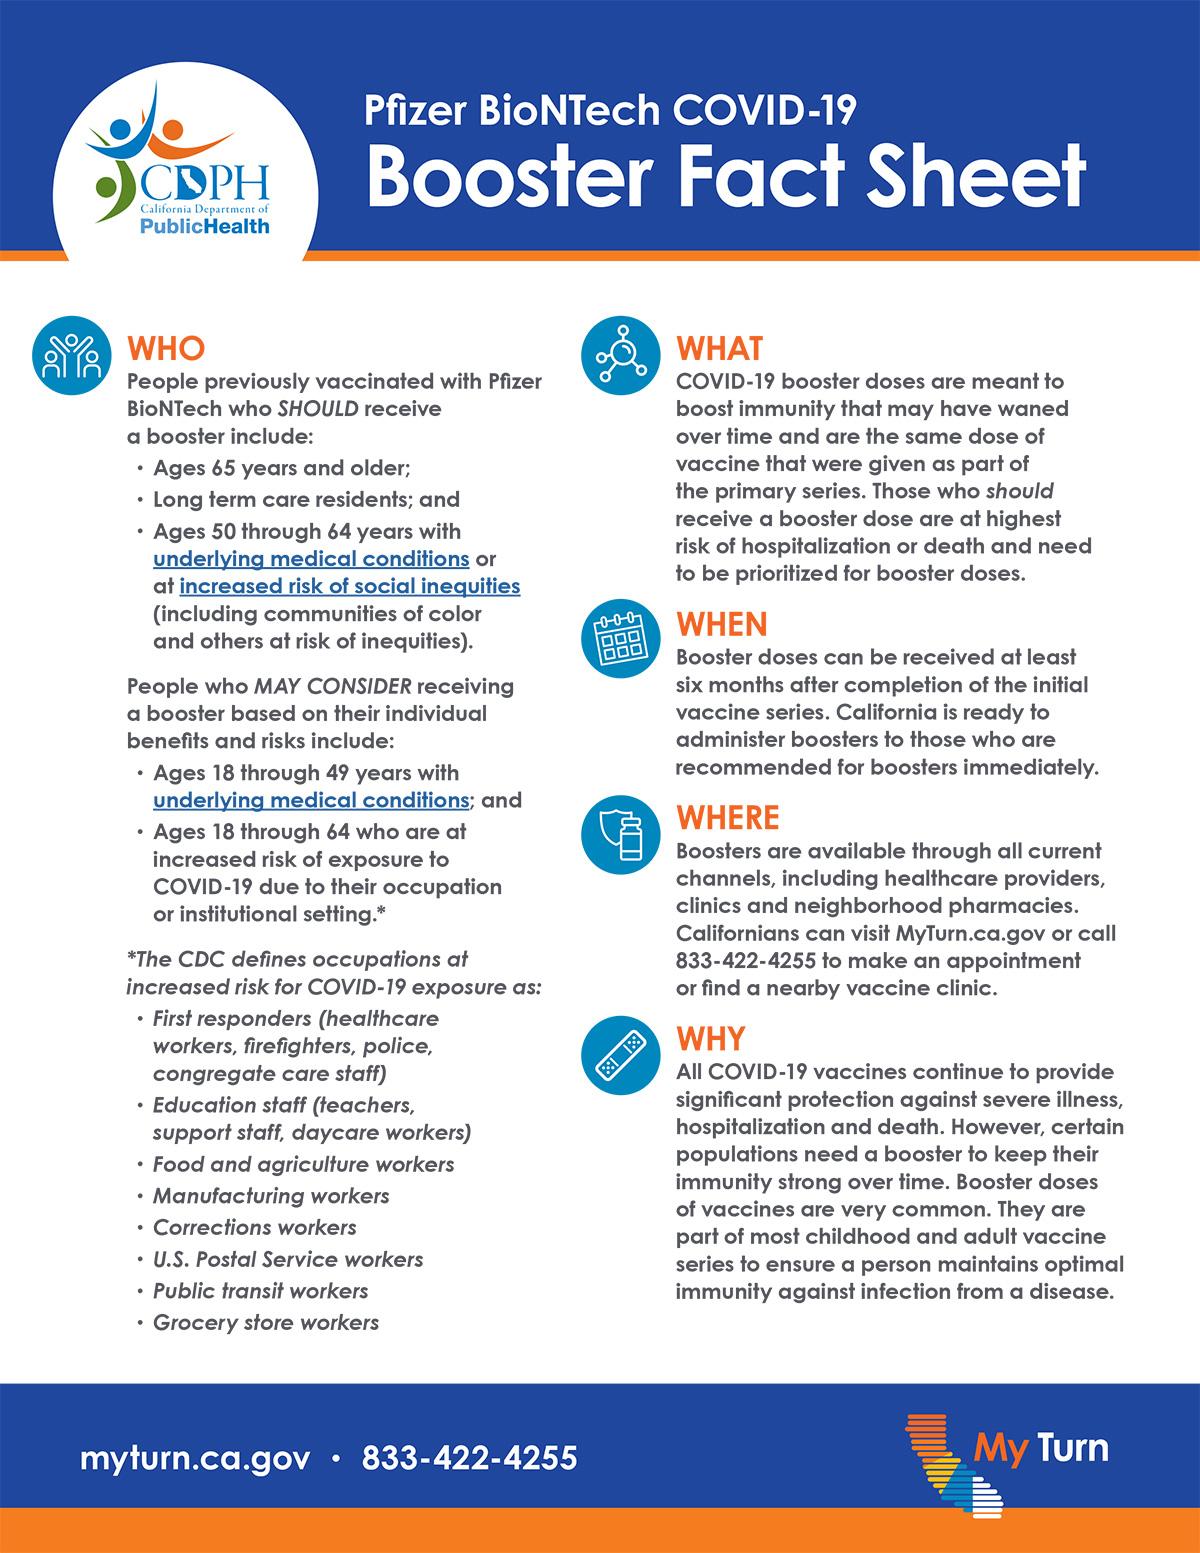 Pfizer BioNTech COVID 19 Booster Fact Sheet